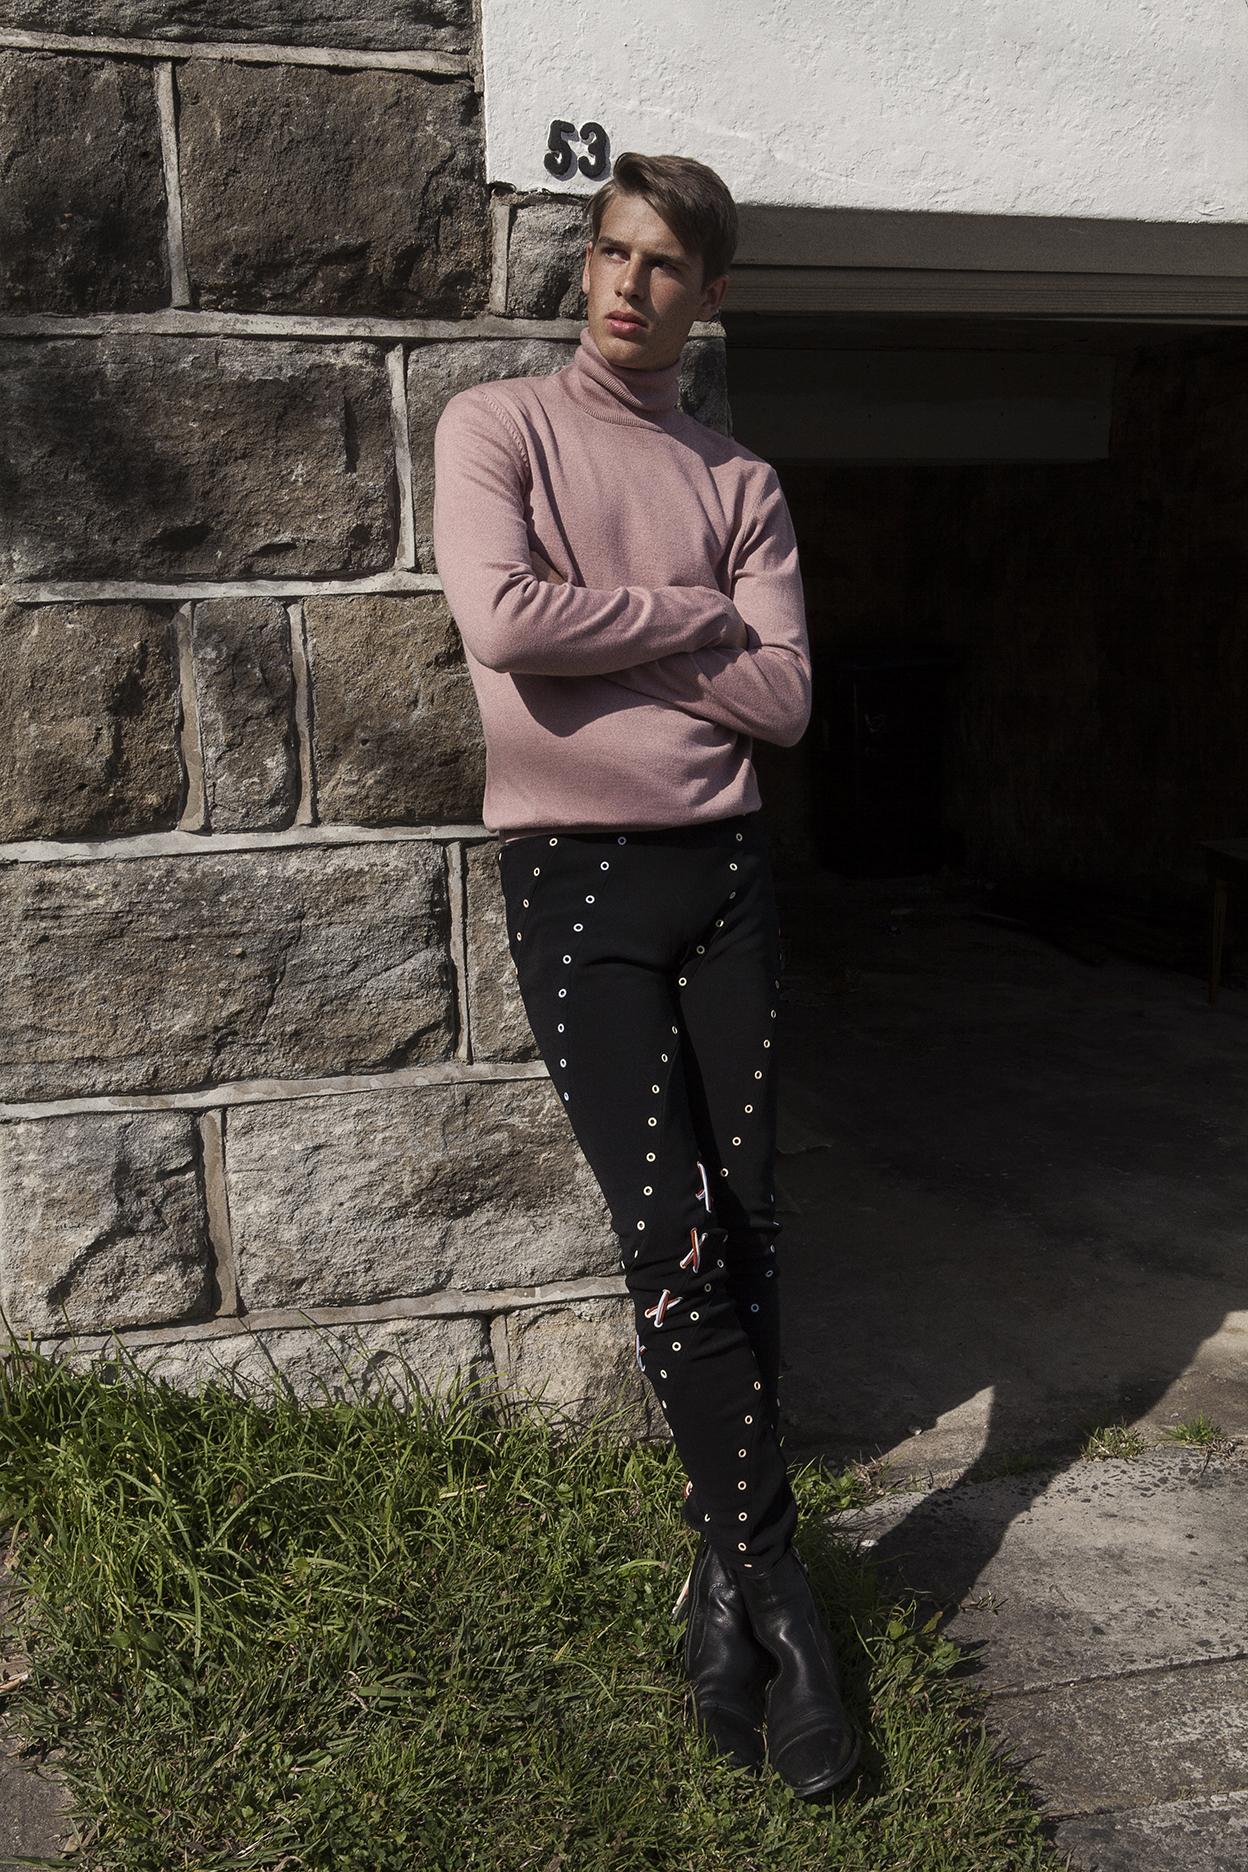 turtleneck  stylists own  pant  bec + bridge  boots  stylists own